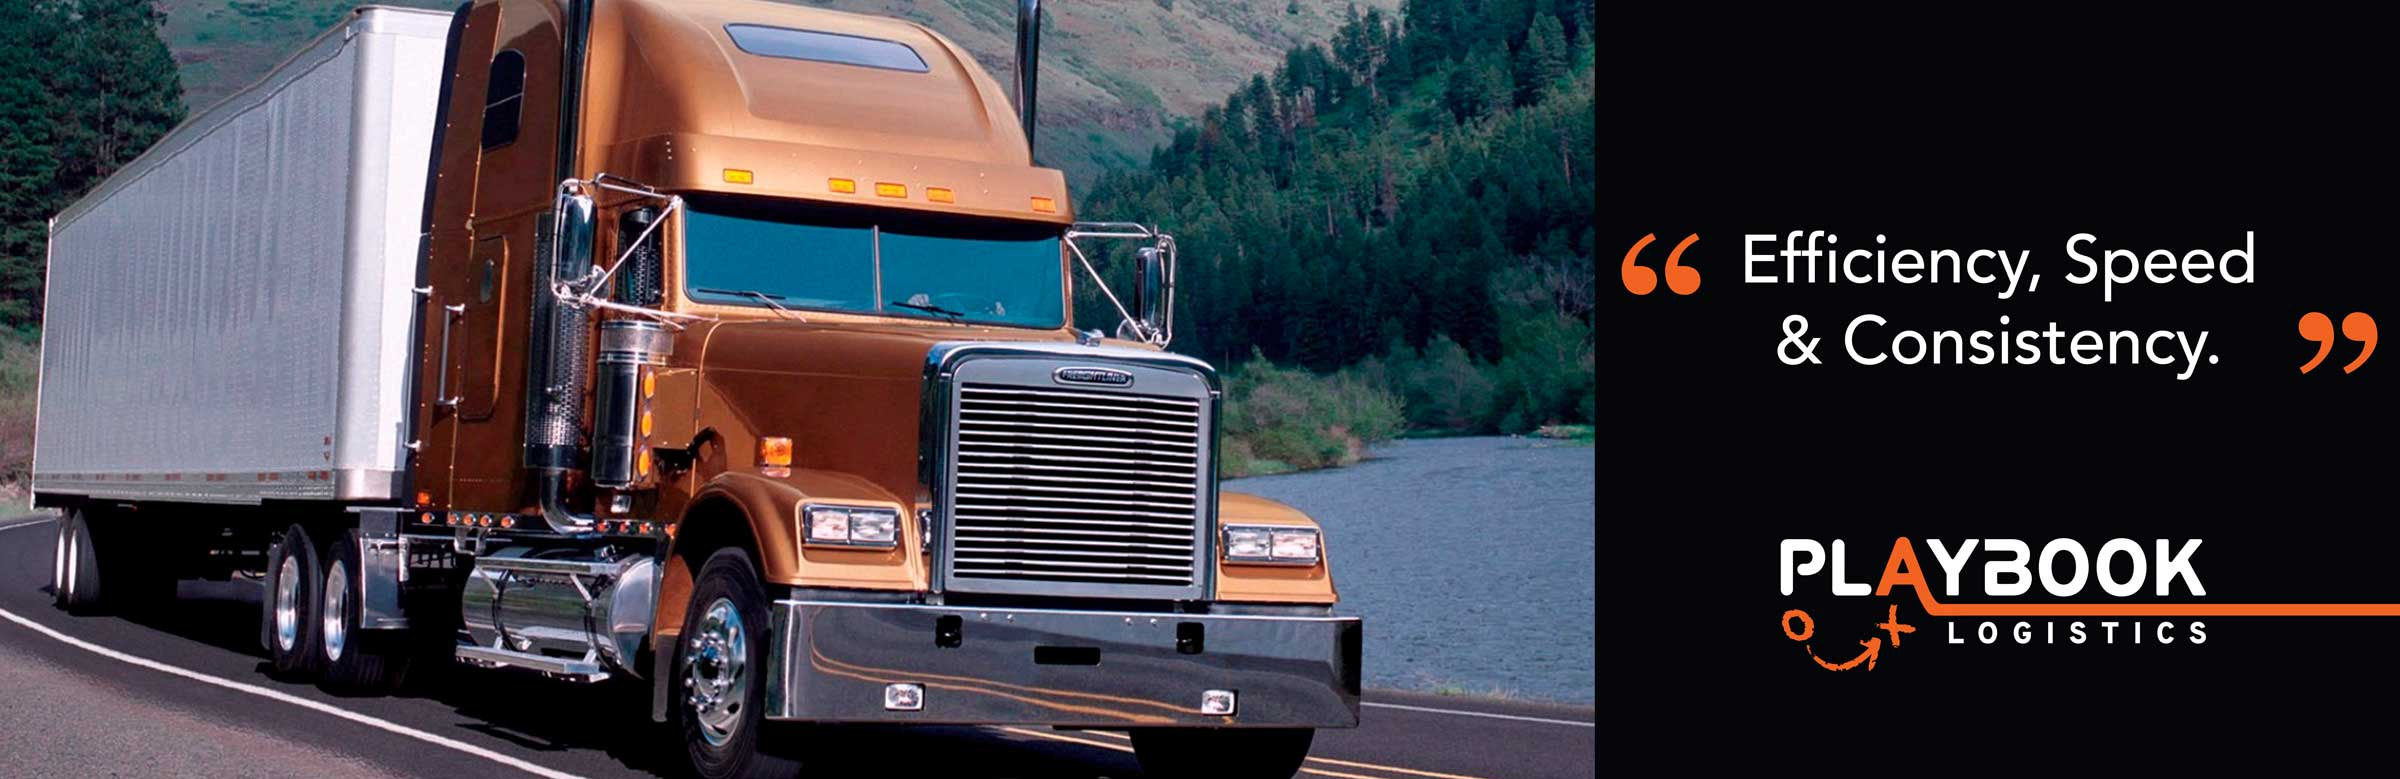 Playbook--Logistics-Speed